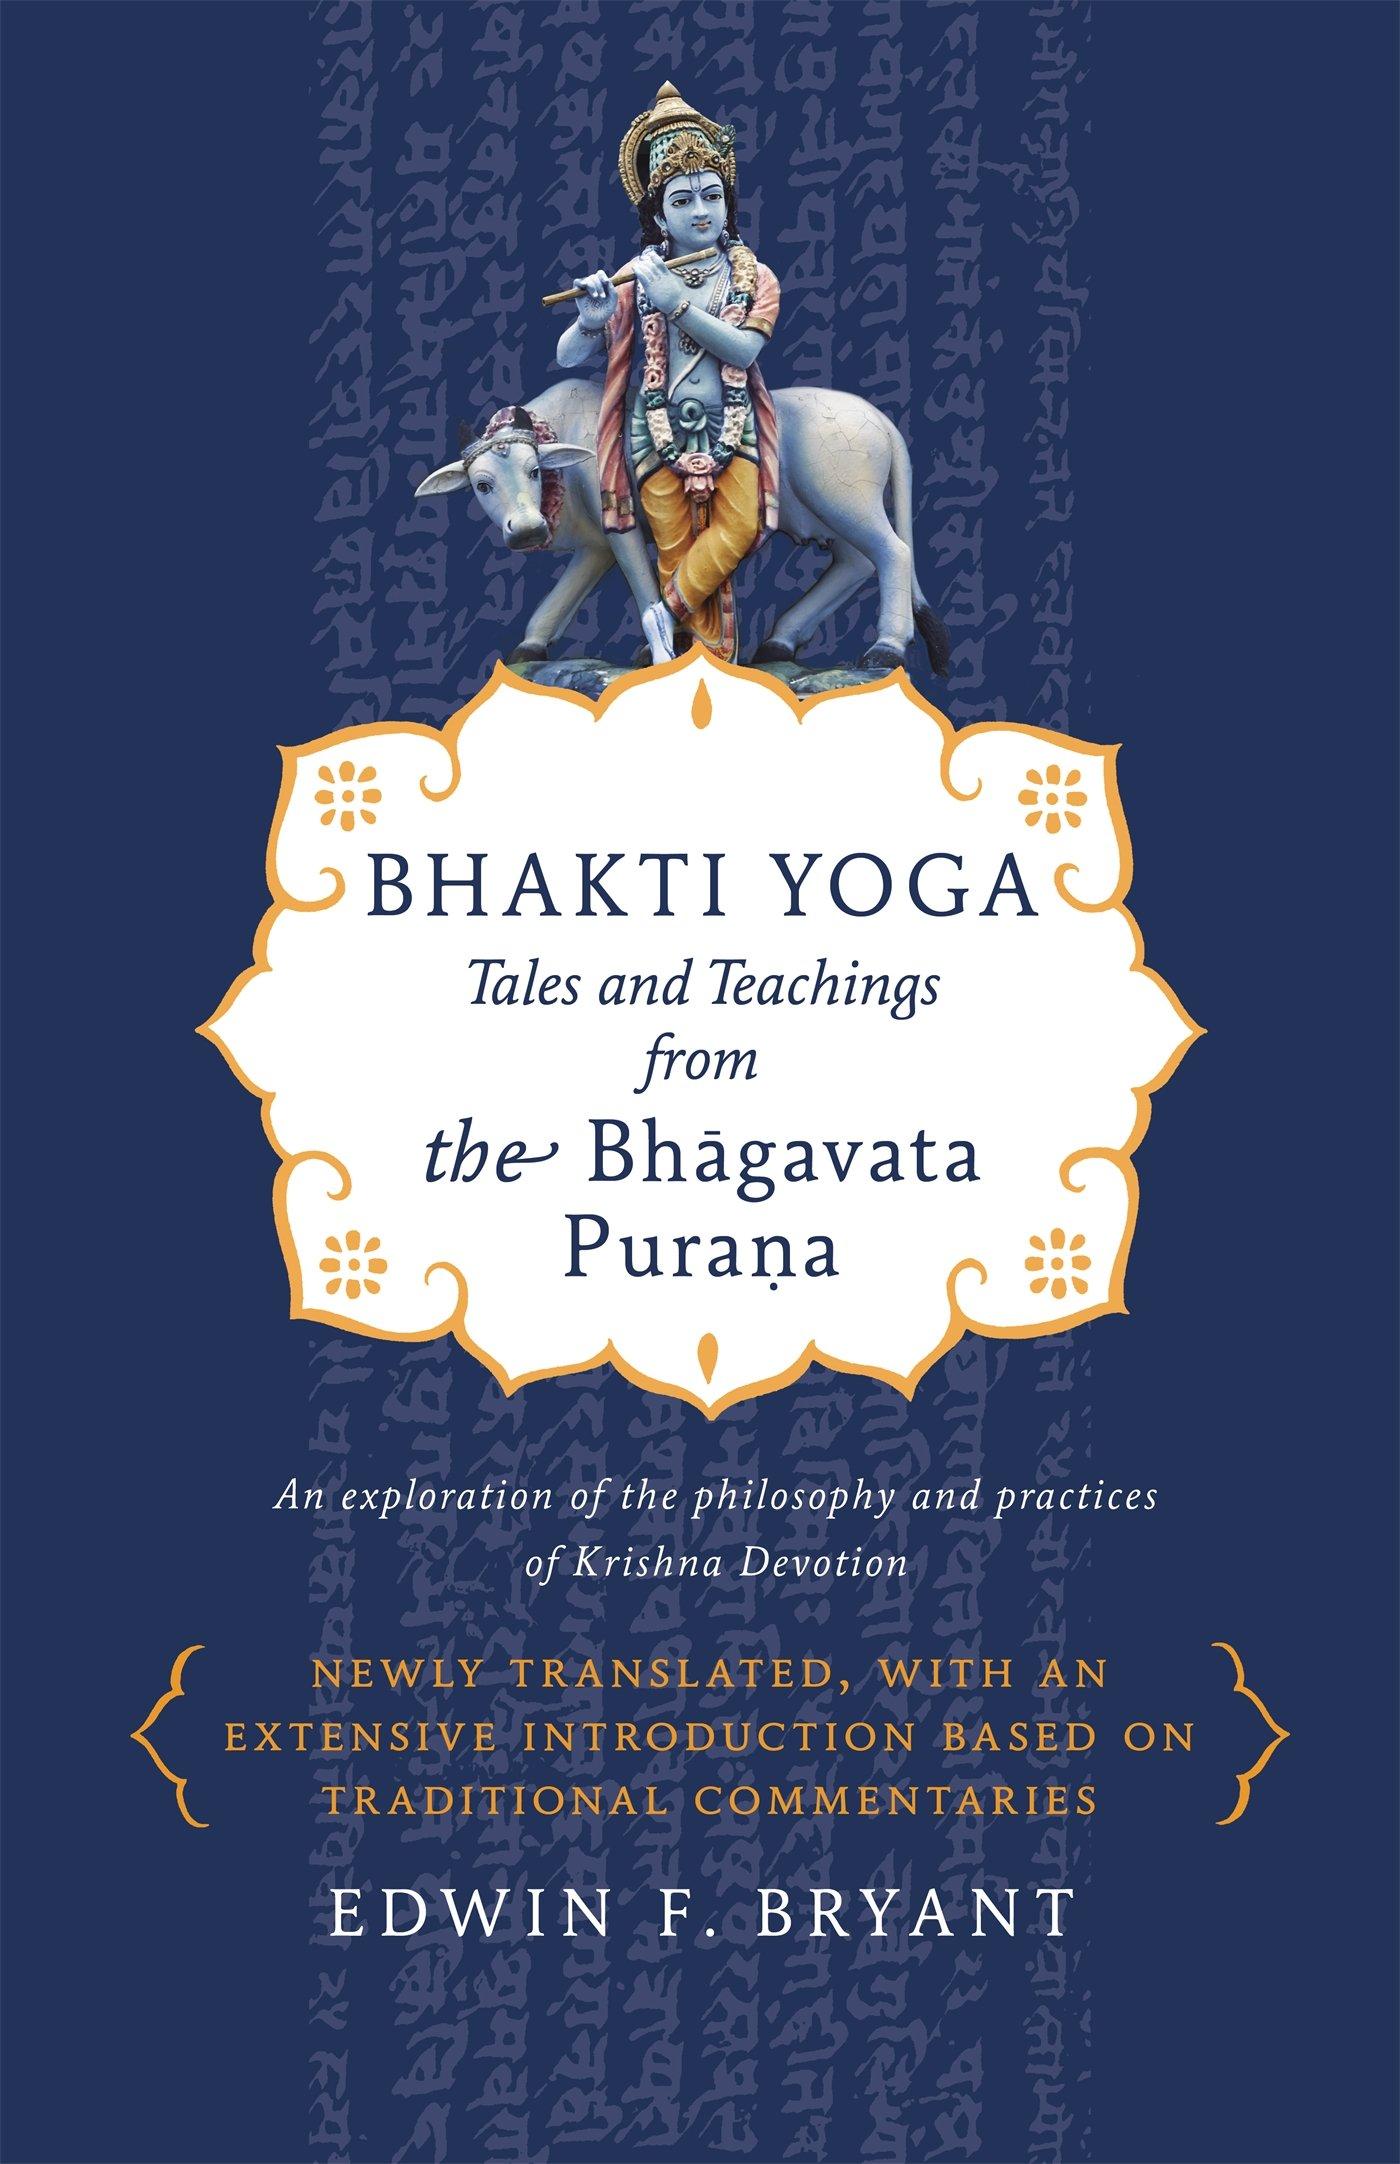 Bhakti Yoga Tales And Teachings From The Bhagavata Purana Bryant Edwin F 9780865477759 Amazon Com Books